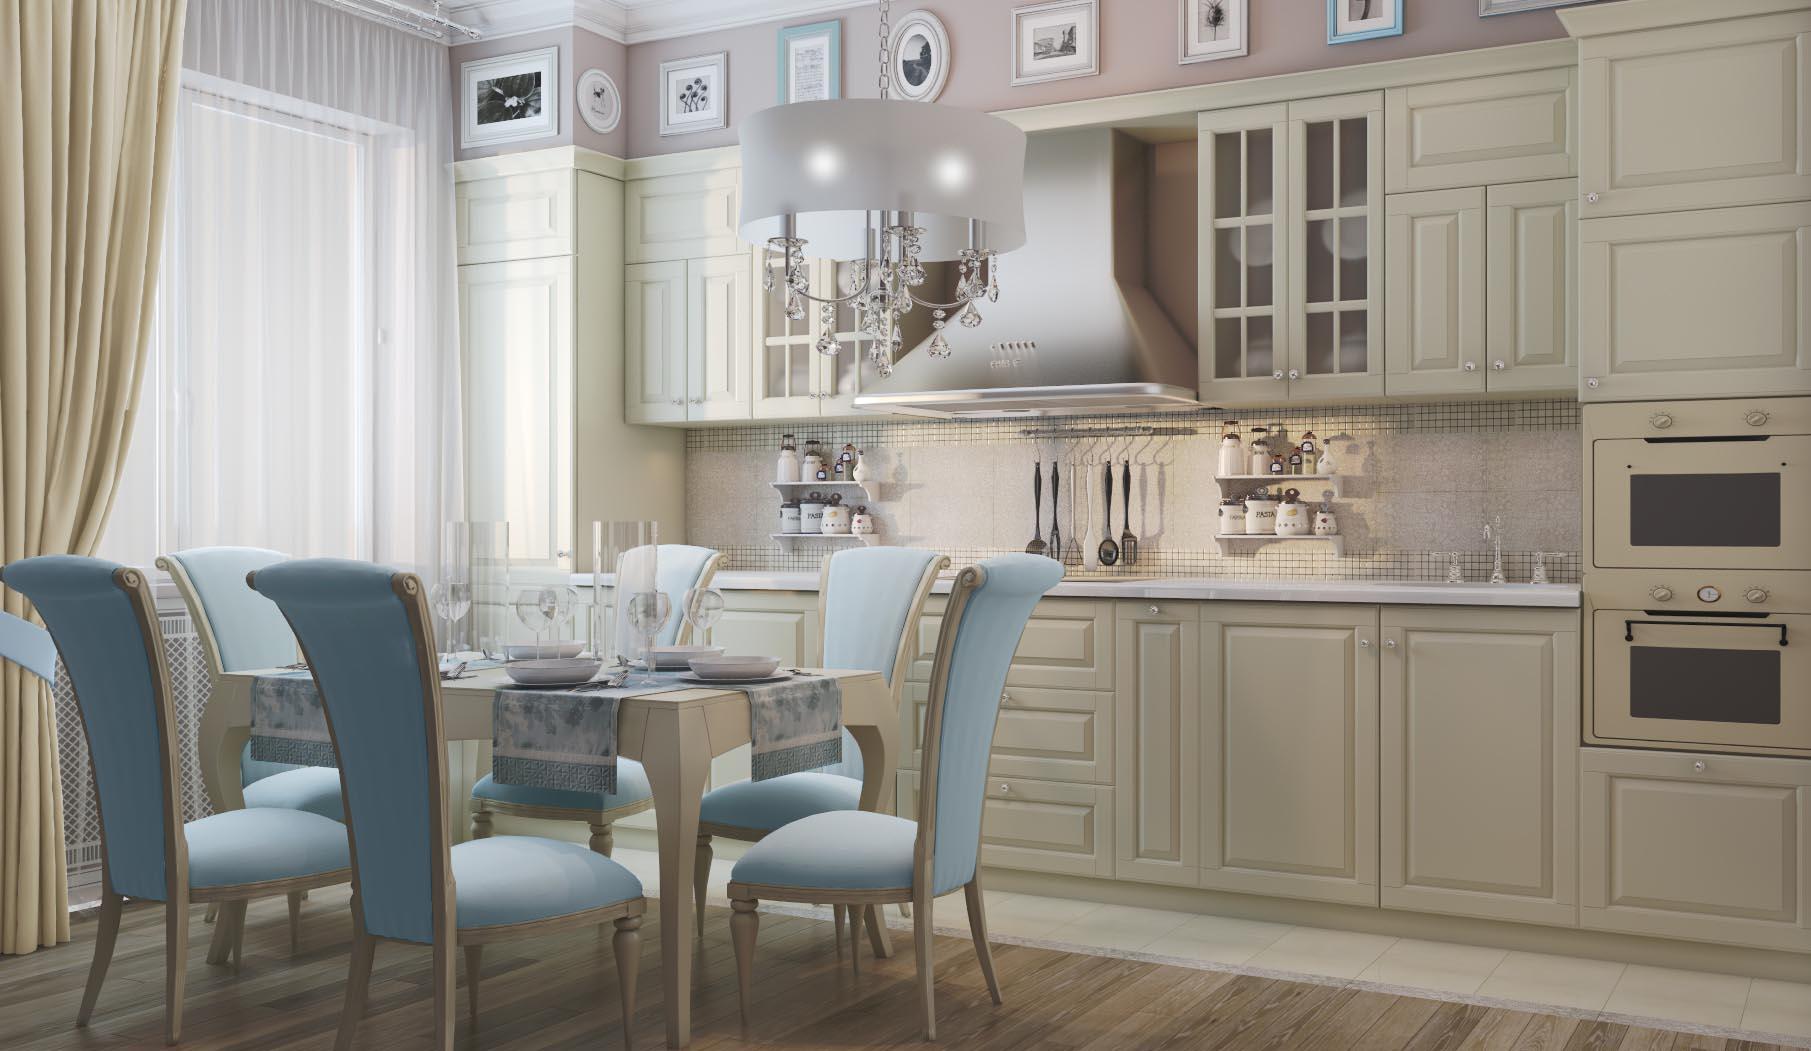 моя кухня фотоотчет Radulova